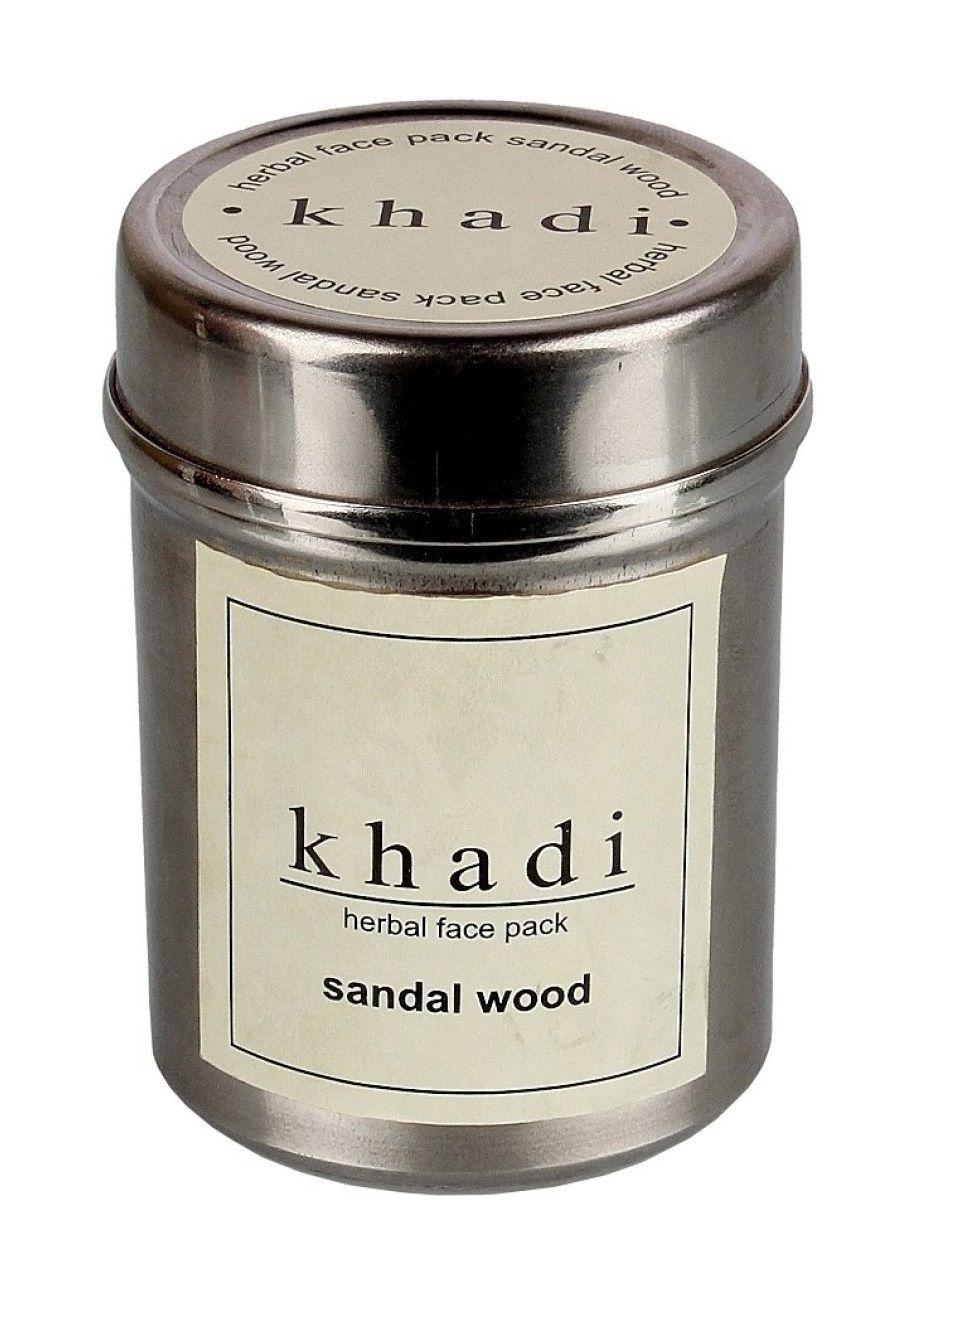 khadi-maseczka-drzewo-sandalowe